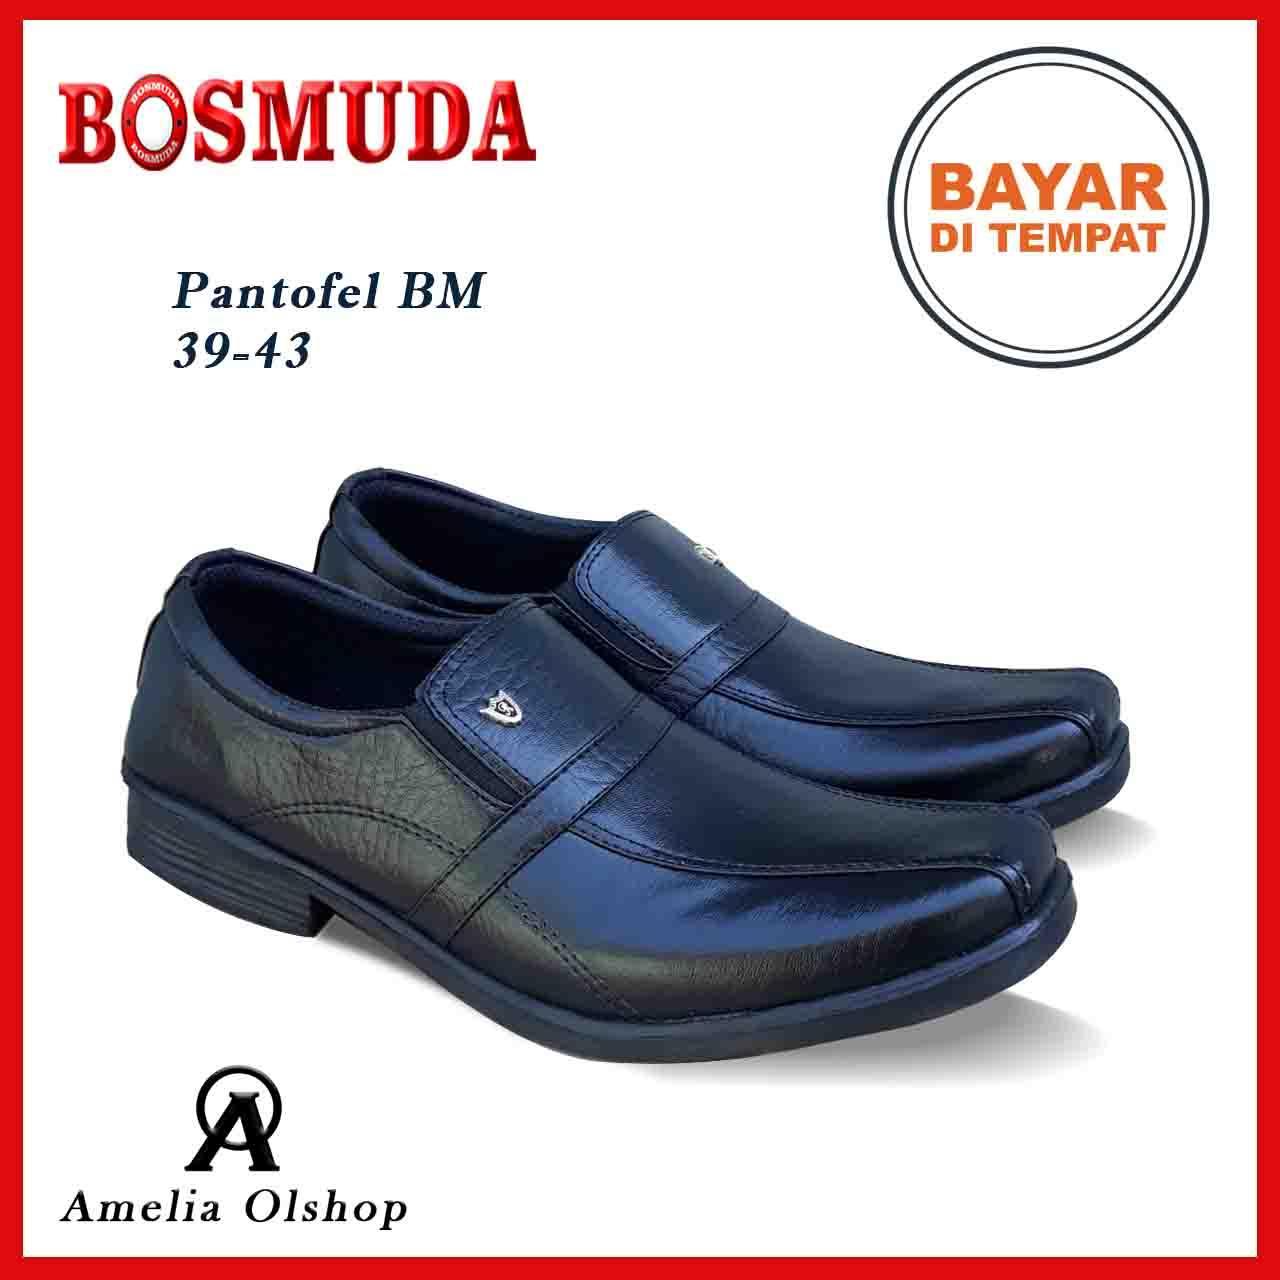 Amelia Olshop - Promo Sepatu Pantofel BOSMUDA   Sepatu Pantofel   Sepatu  Pria   Sepatu Pantofel 1a135422c9